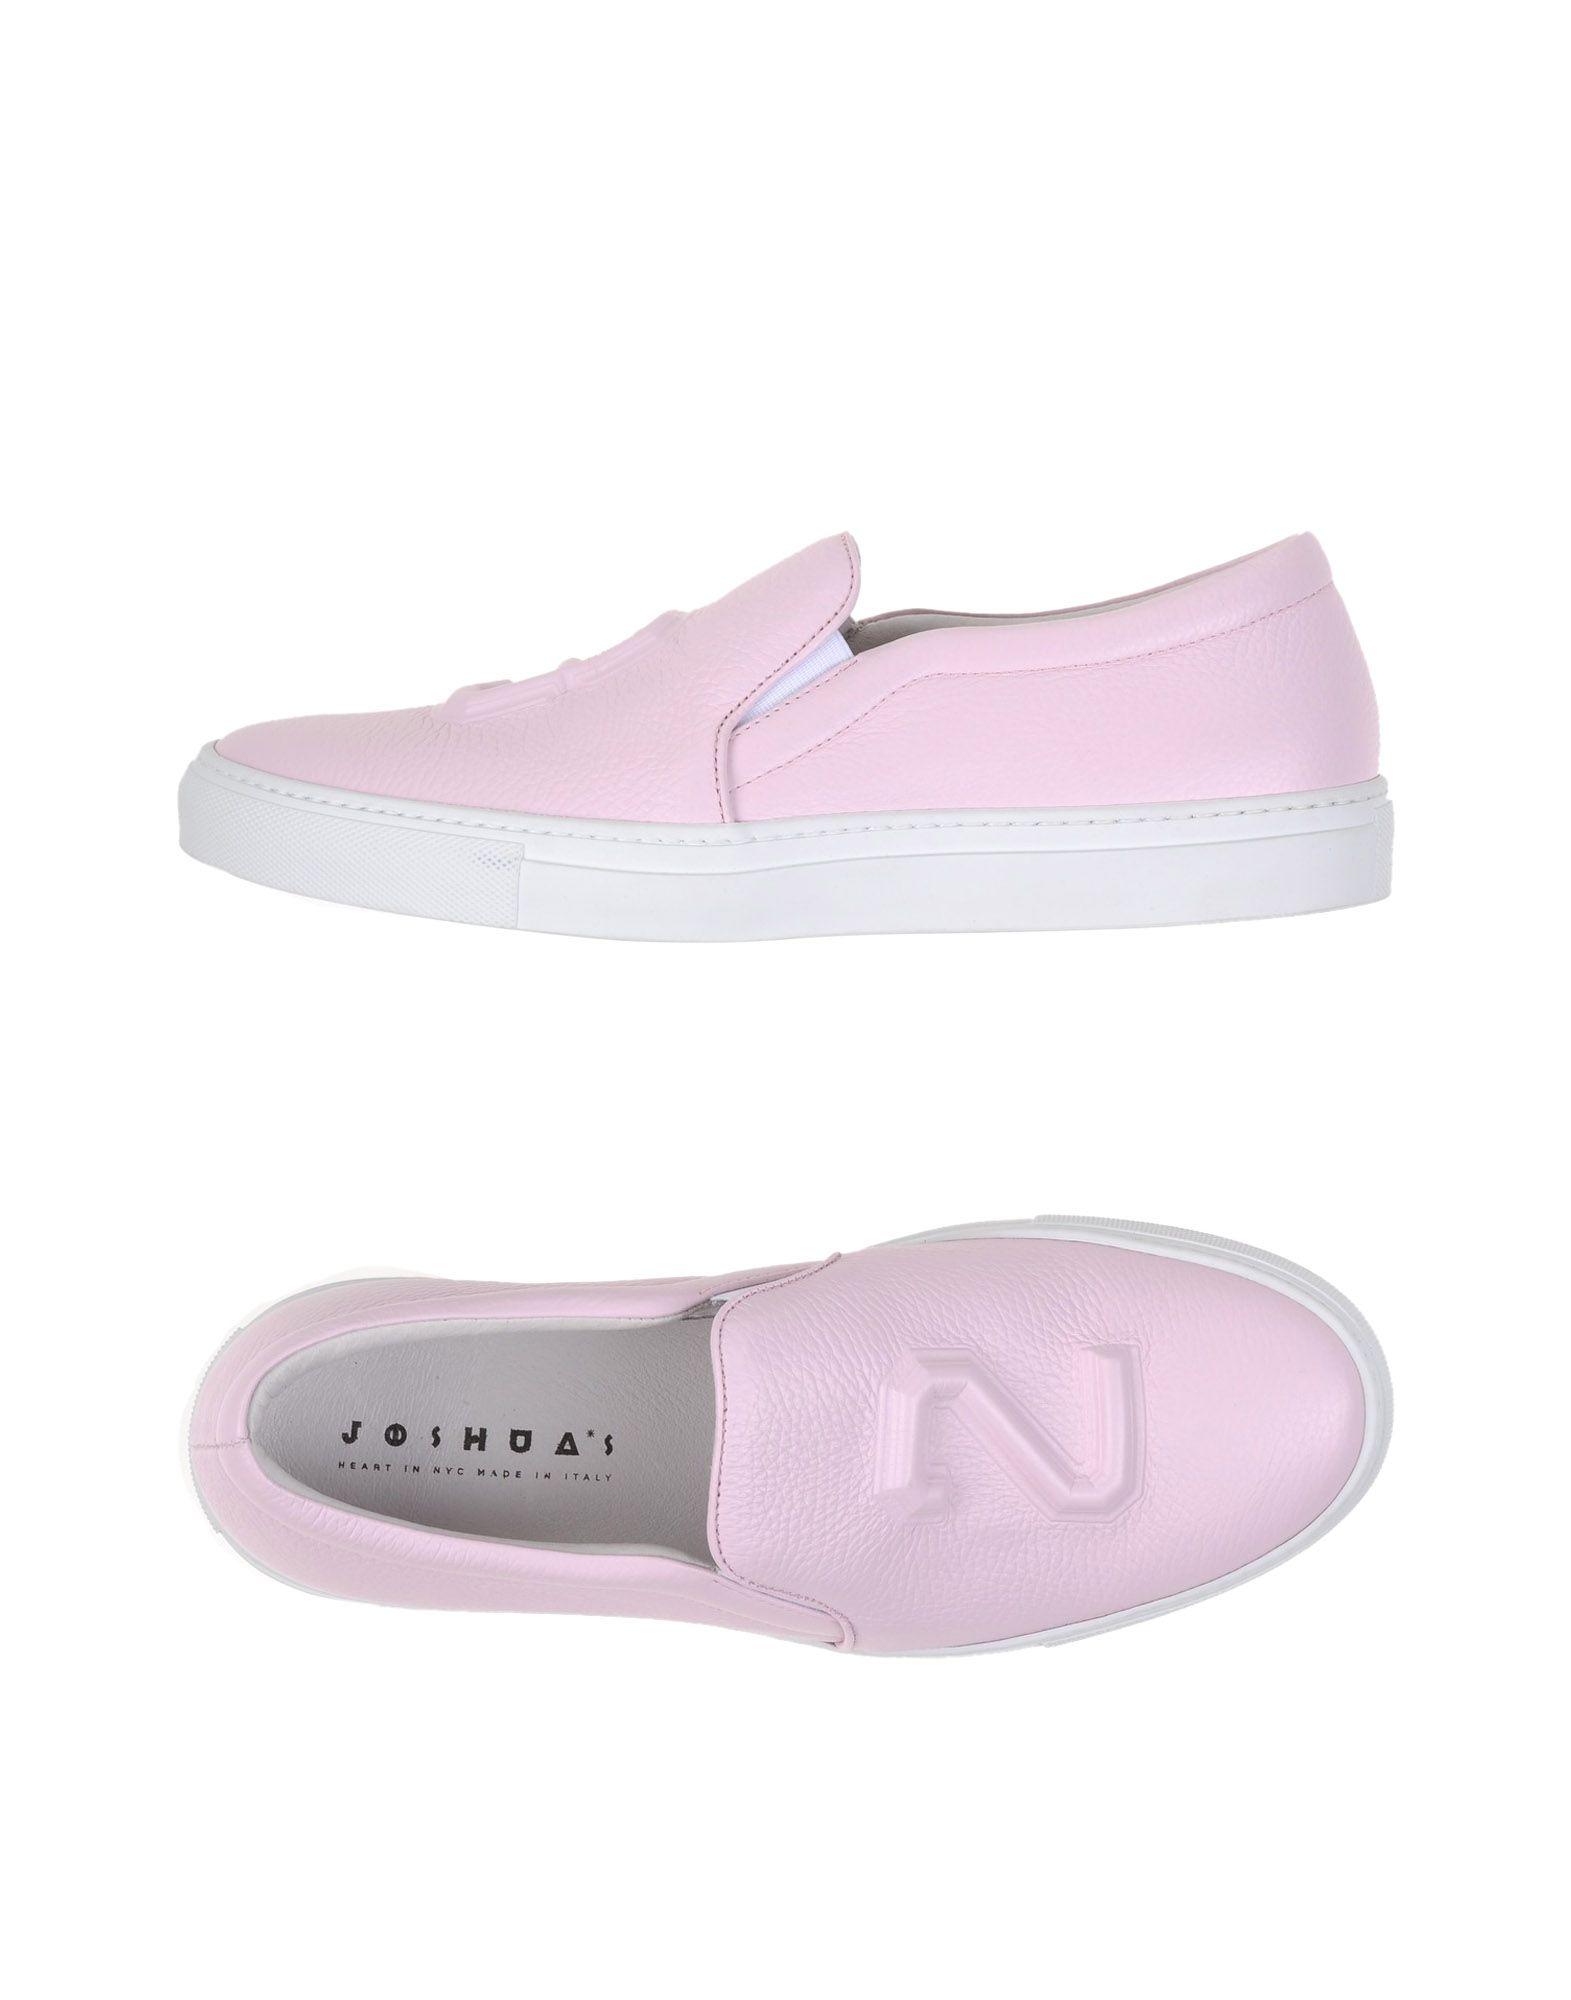 Joshua*S Sneakers Herren  11120946KO Gute Gute 11120946KO Qualität beliebte Schuhe 39646e